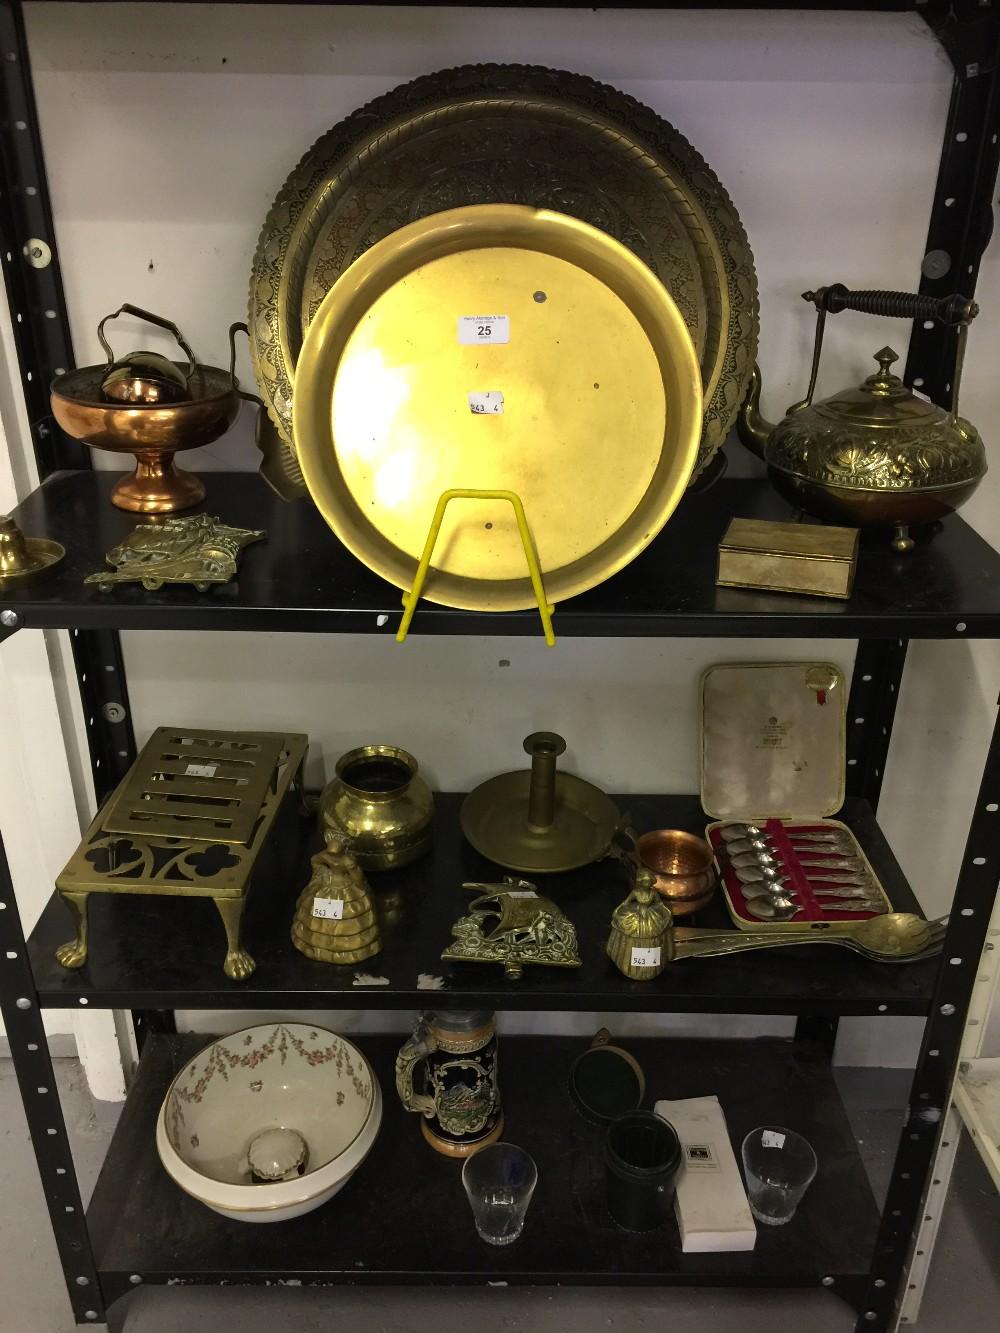 Lot 25 - Metal Ware: Brass ware, copper ware, glass and ceramic. 3 boxes.